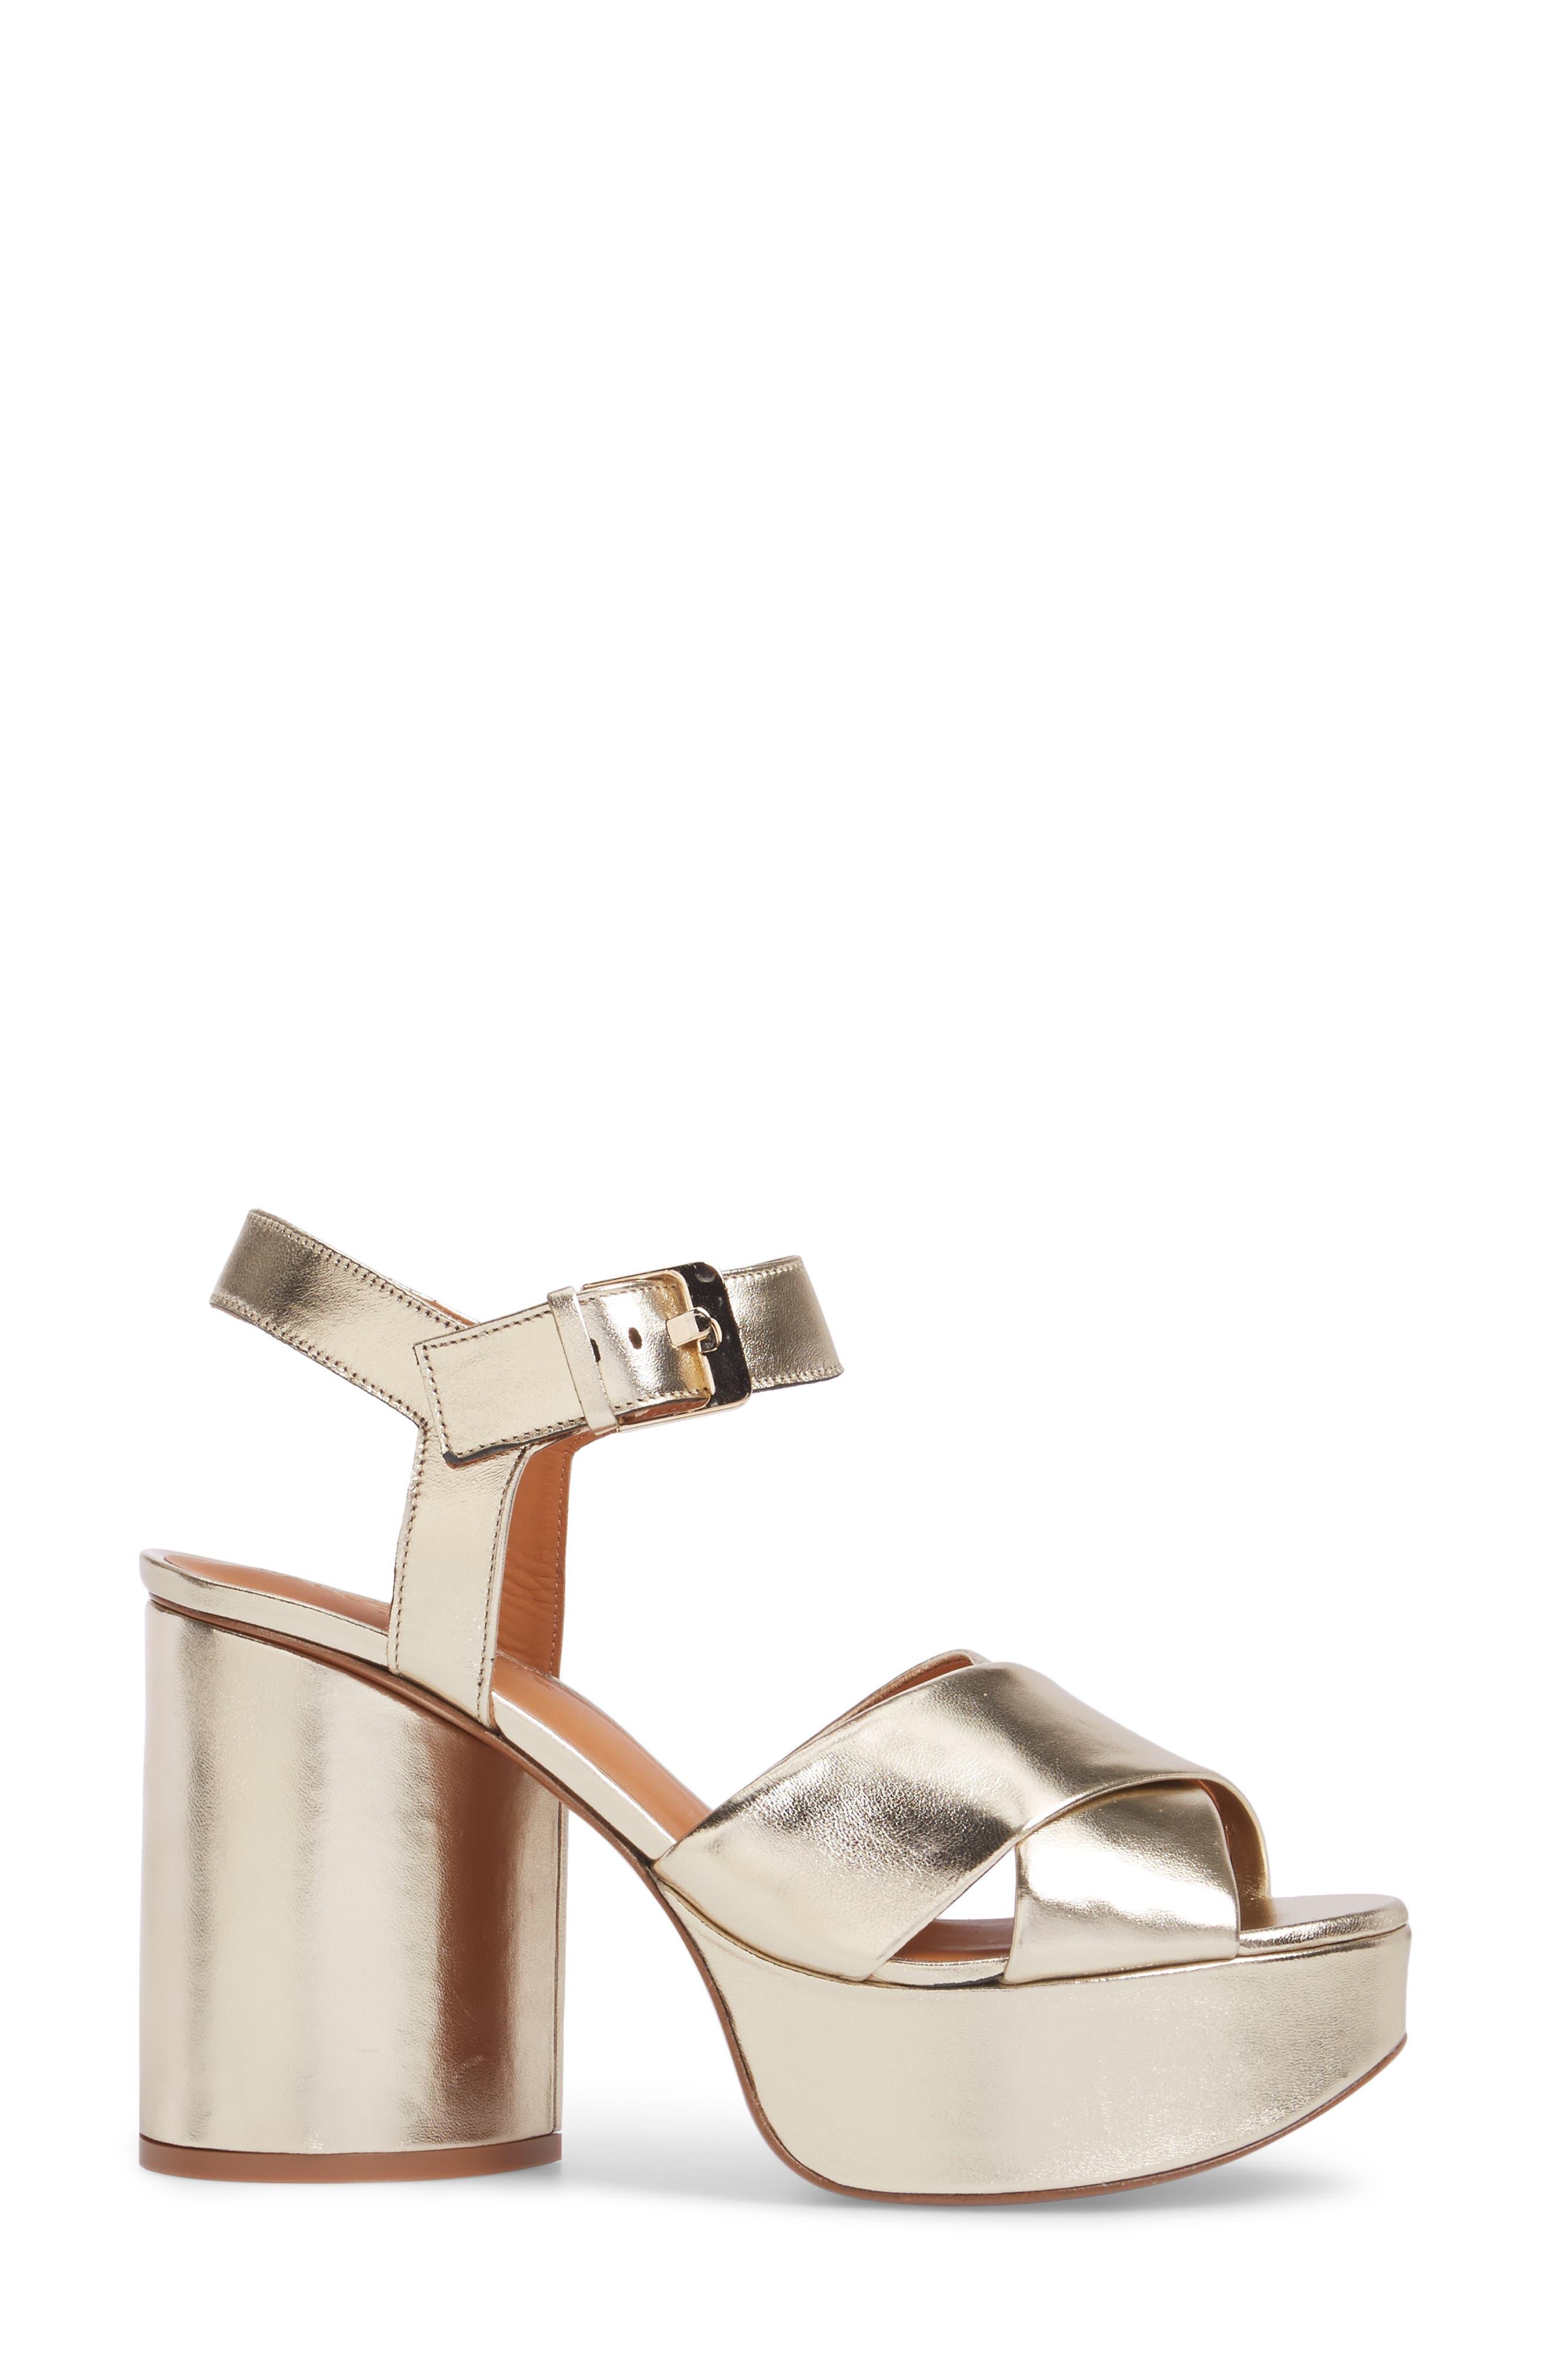 Vianne Ankle Strap Platform Sandal,                             Alternate thumbnail 3, color,                             712